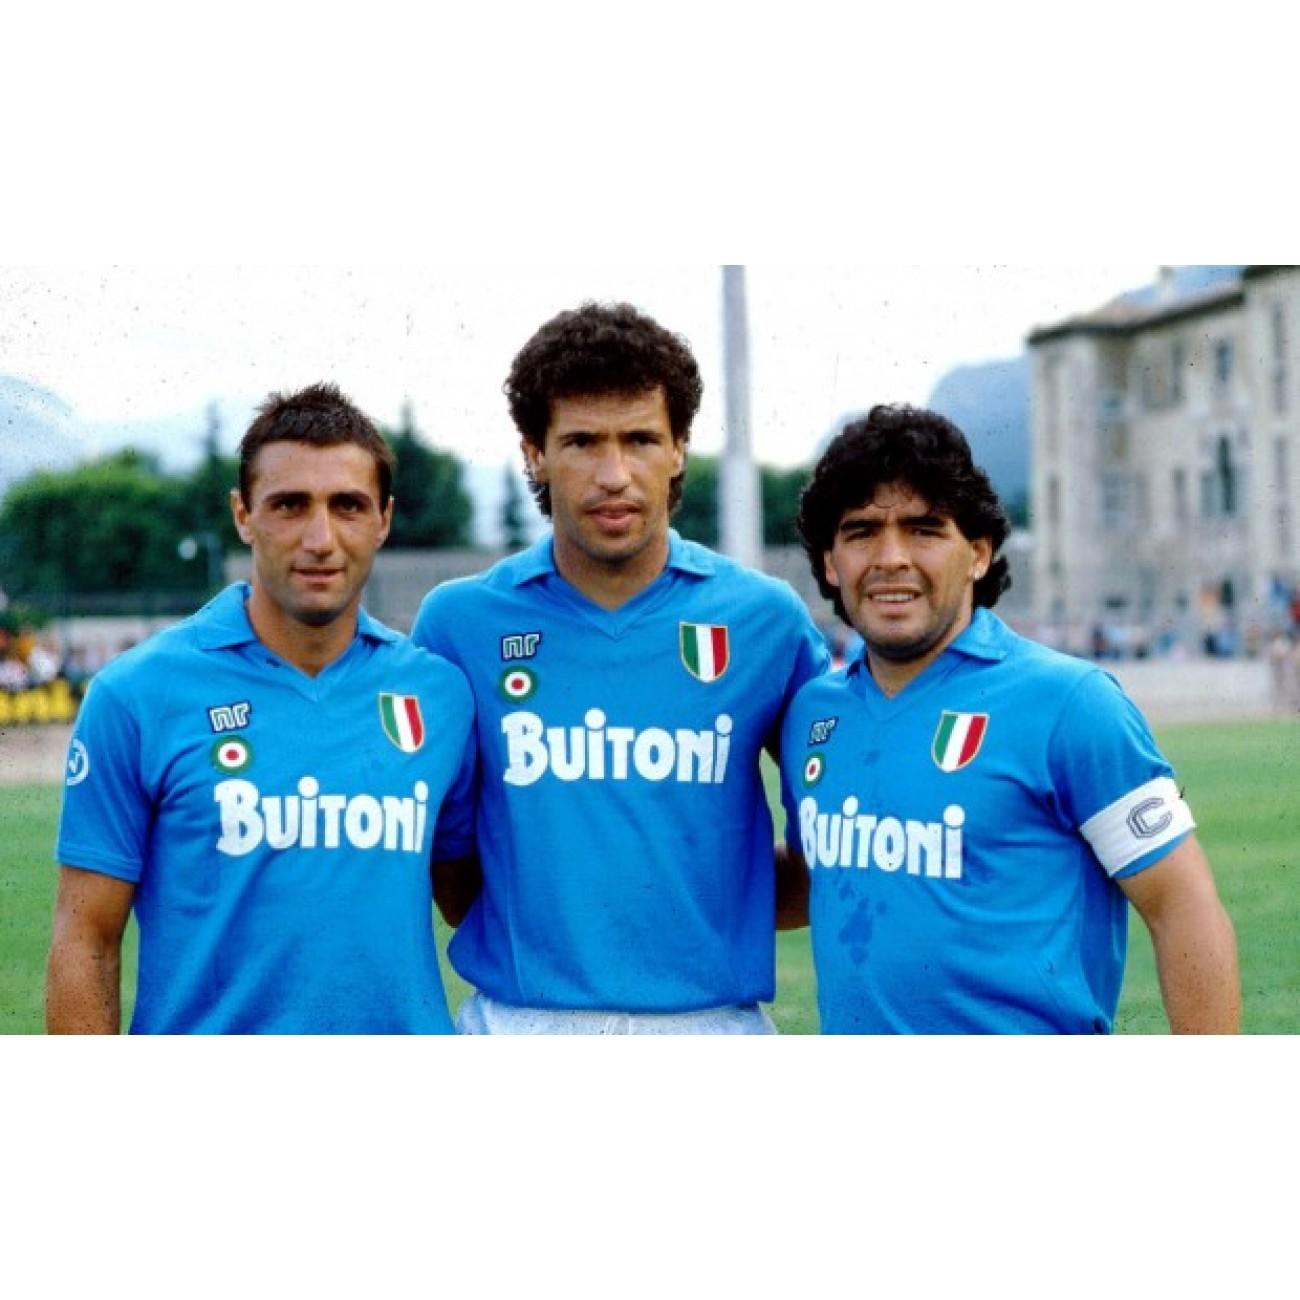 Napoli Maradona retro shirt  5289ad4ef